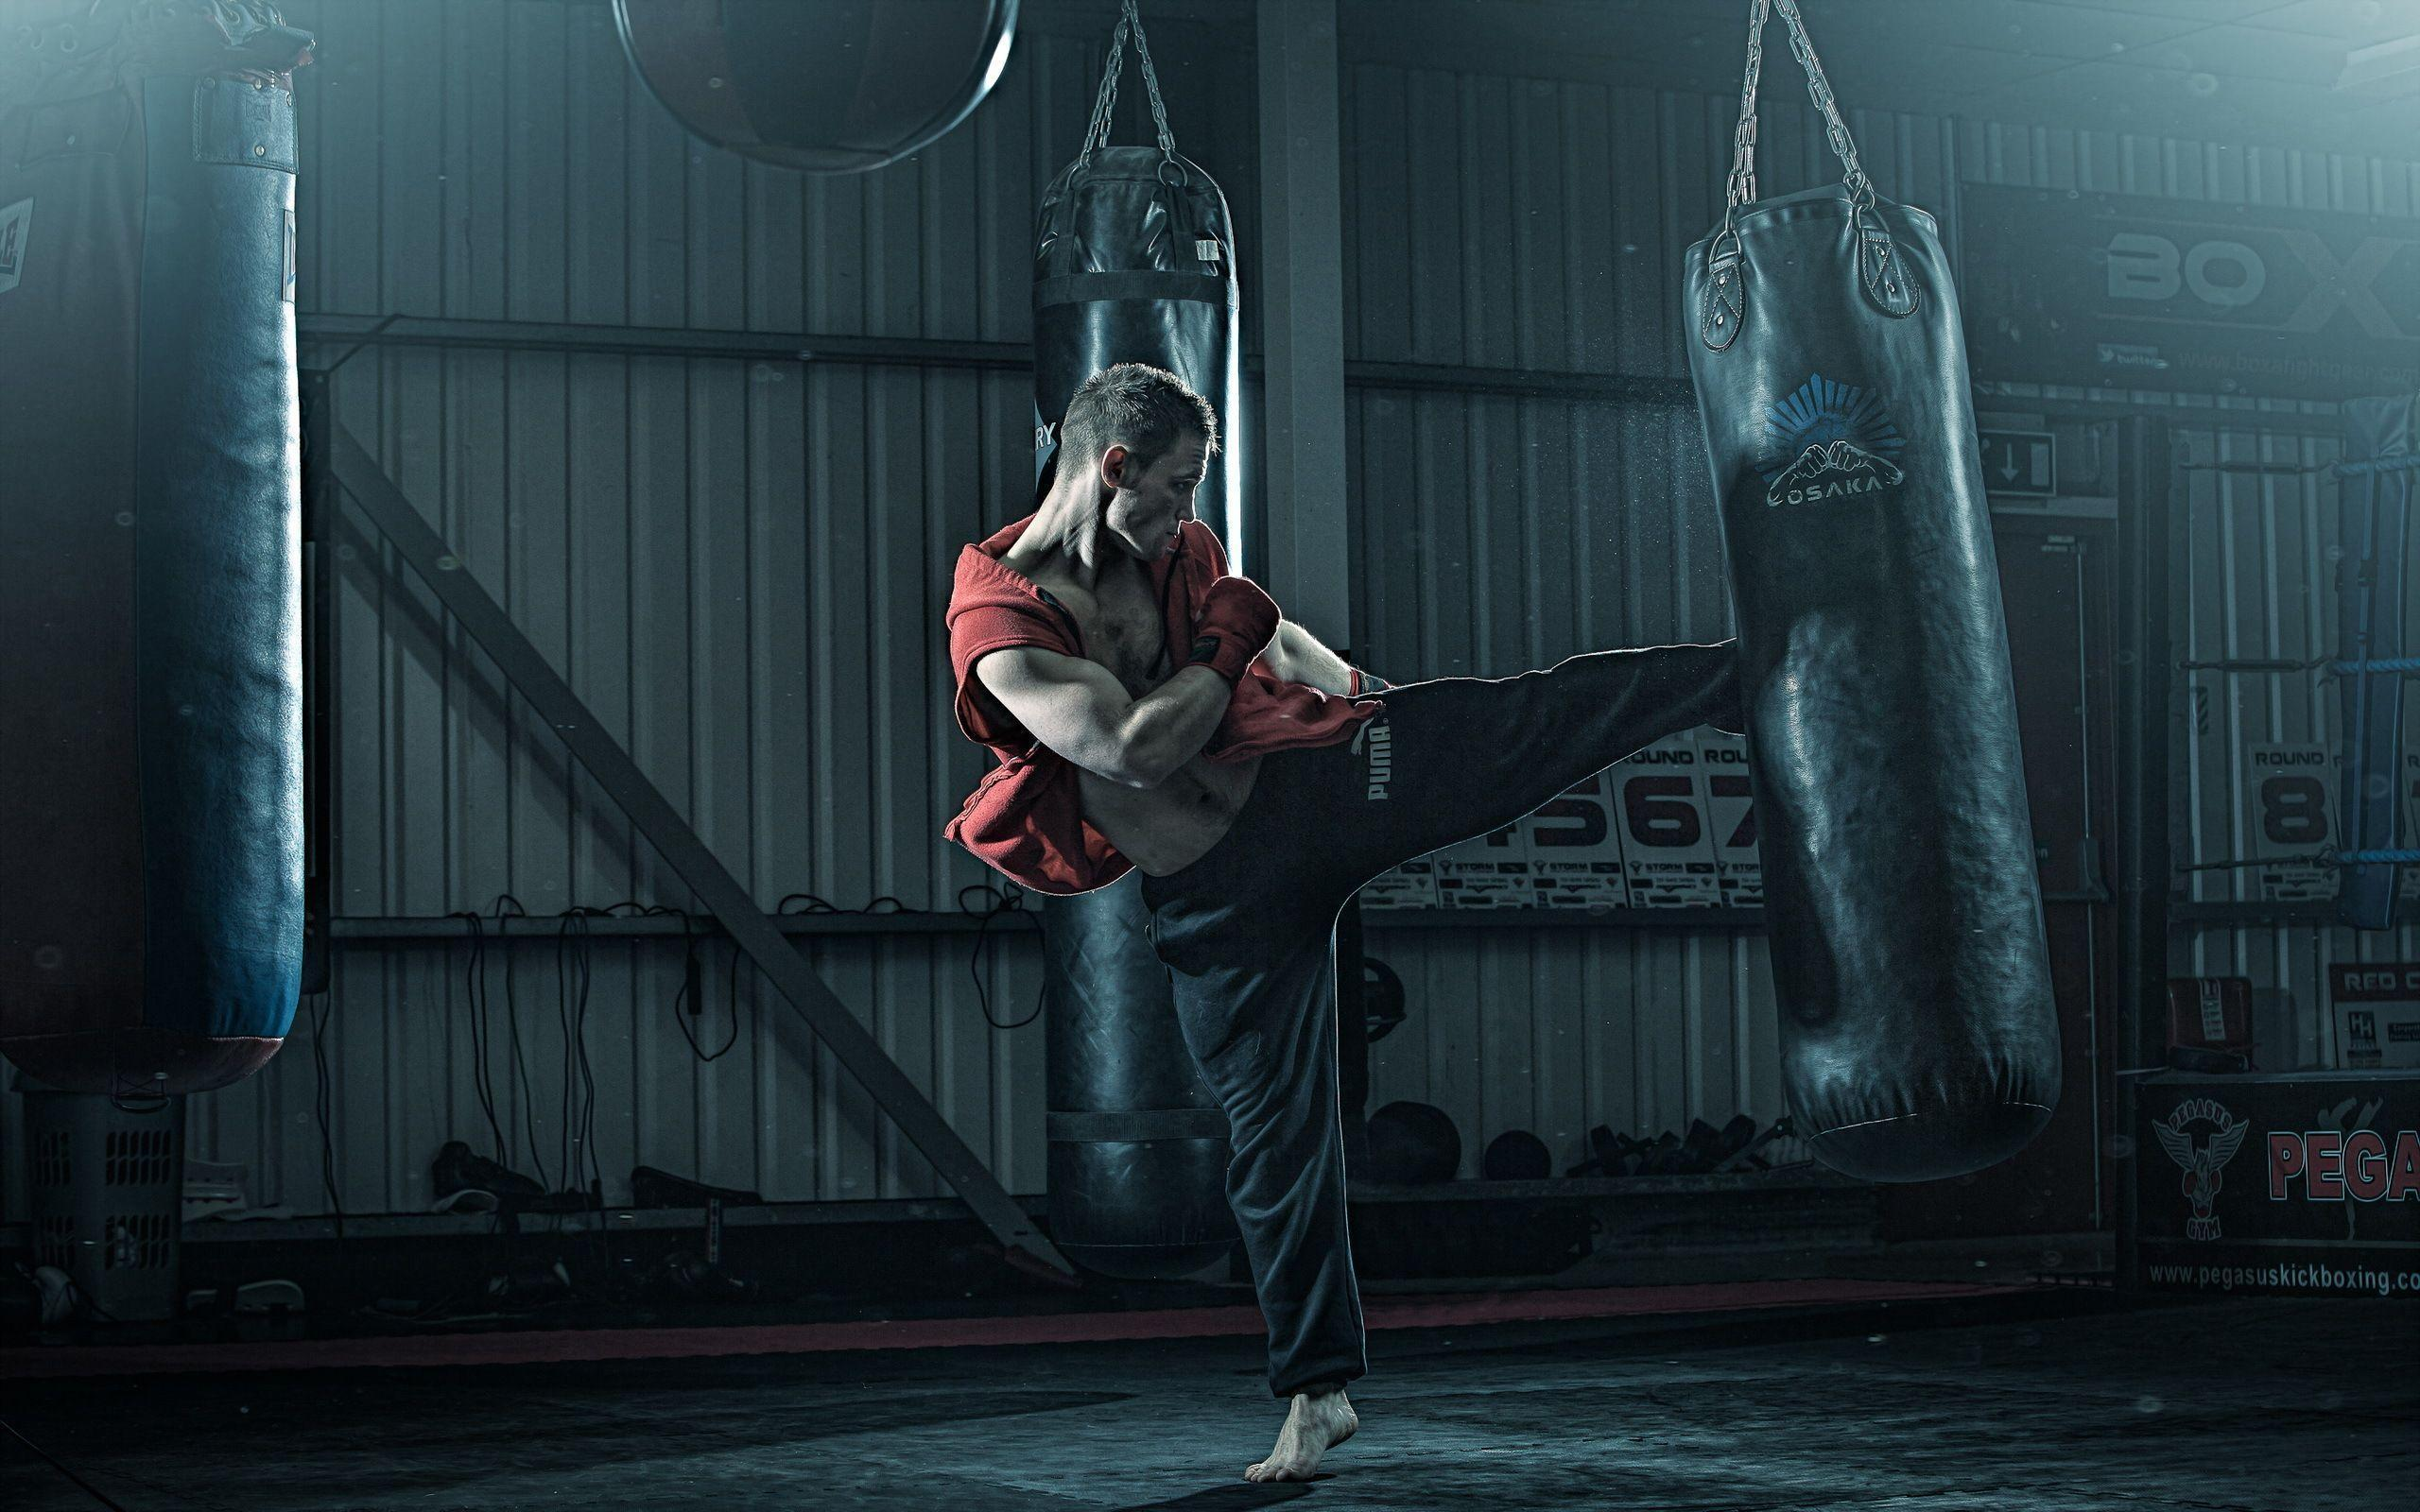 Kick Boxing Wallpapers - Wallpaper Cave